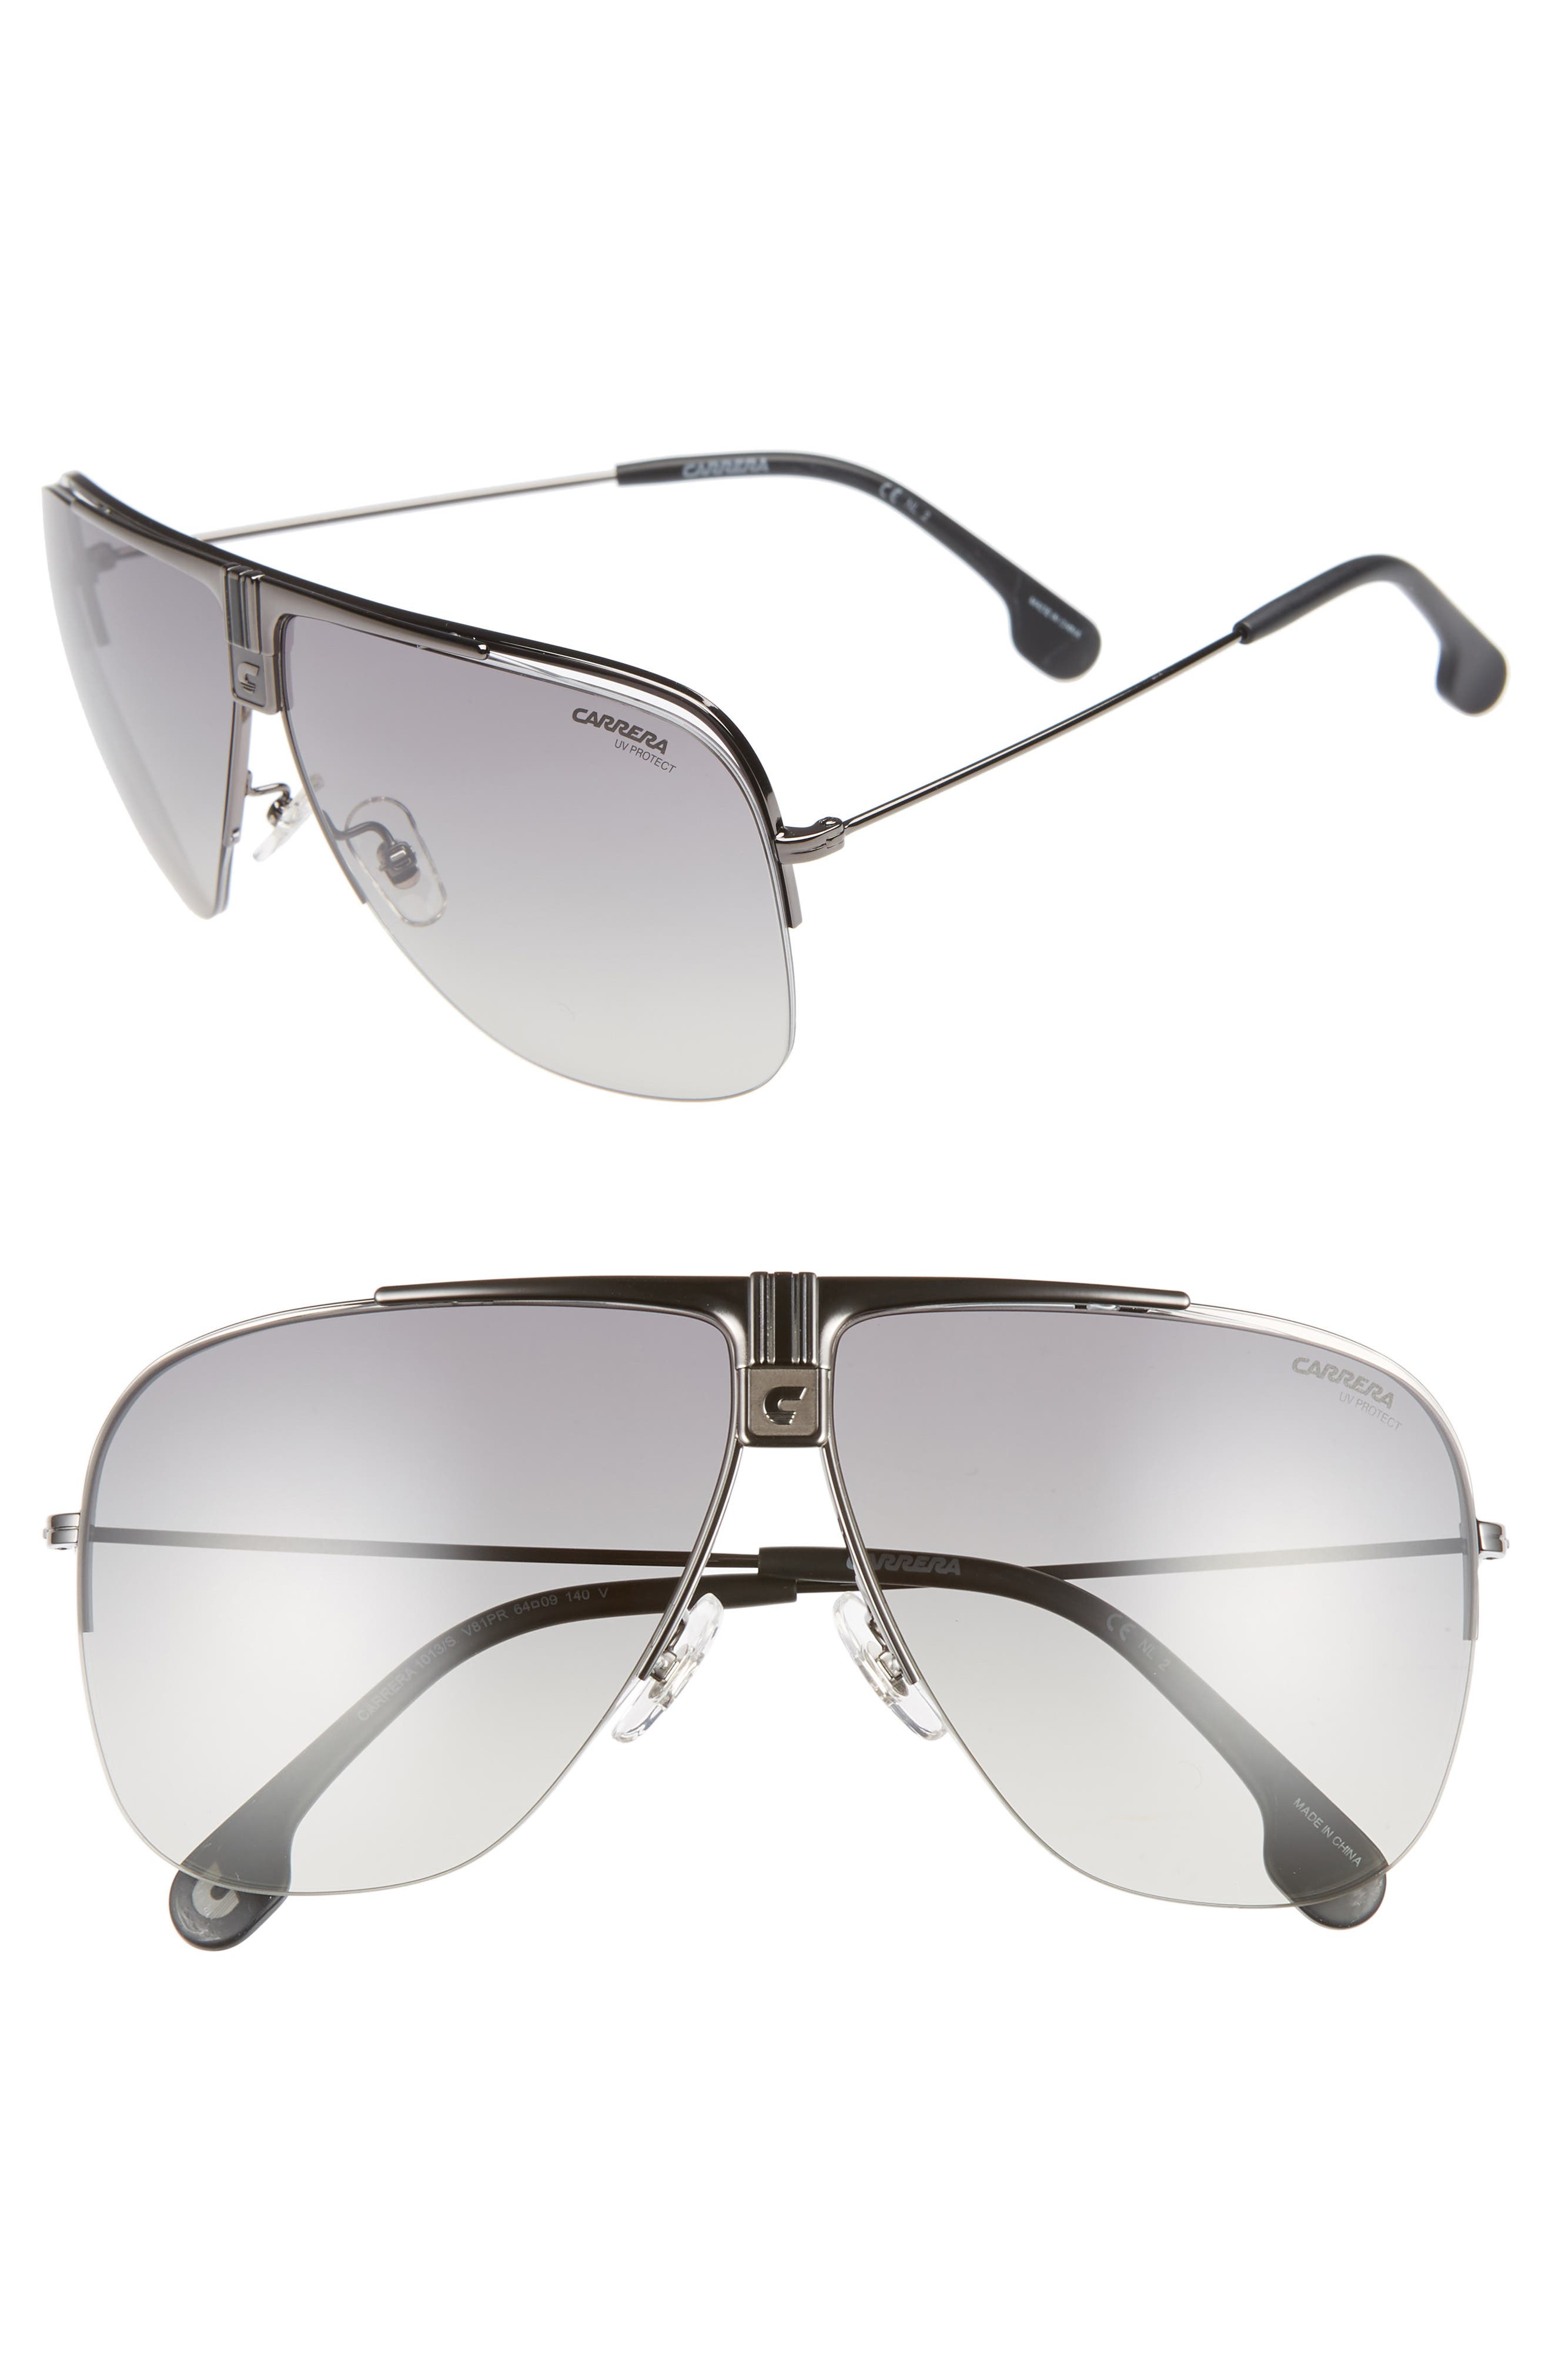 64mm Metal Aviator Sunglasses,                             Main thumbnail 1, color,                             DARK RUTHENIUM/ BLACK